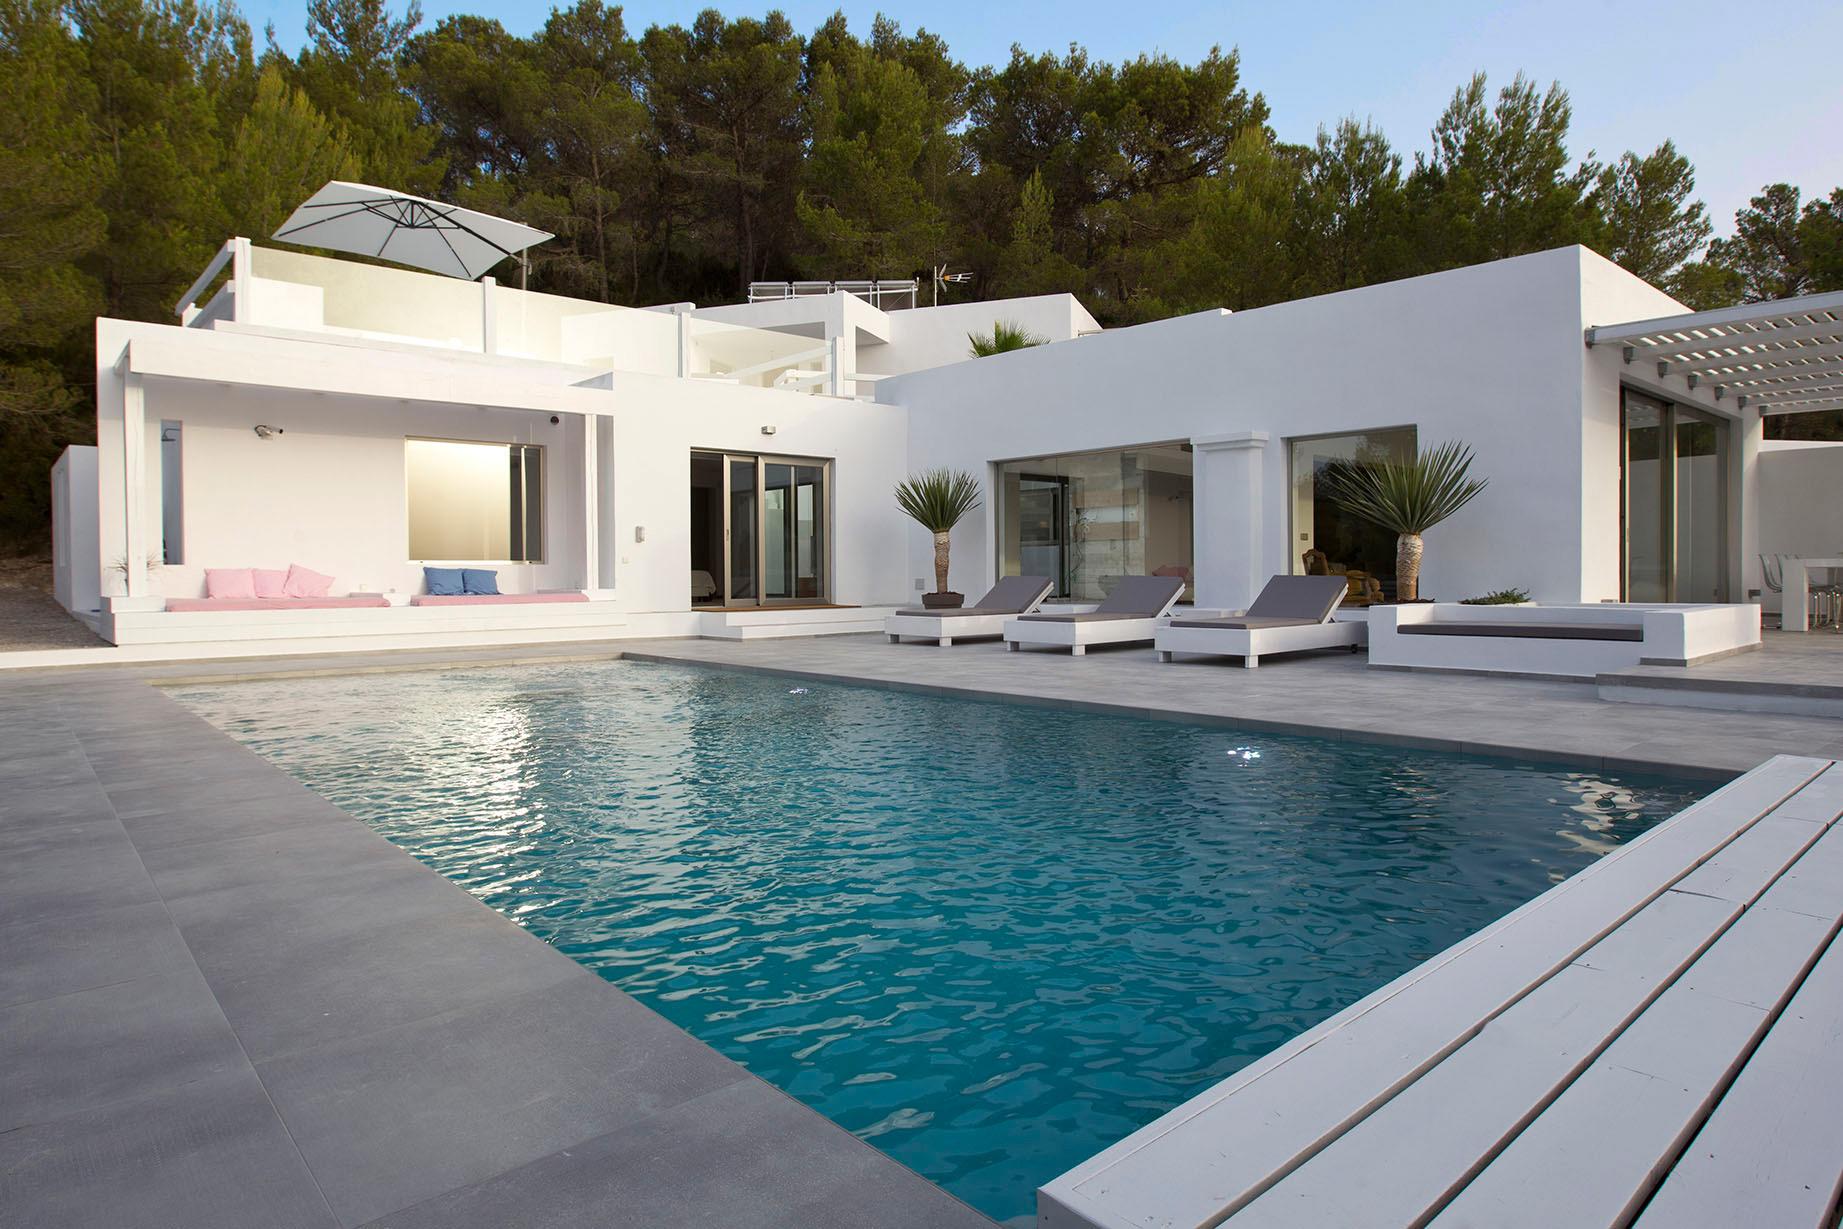 Alquiler de Chalet en Cala Tarida - Ibiza (Ref. 818) - 3